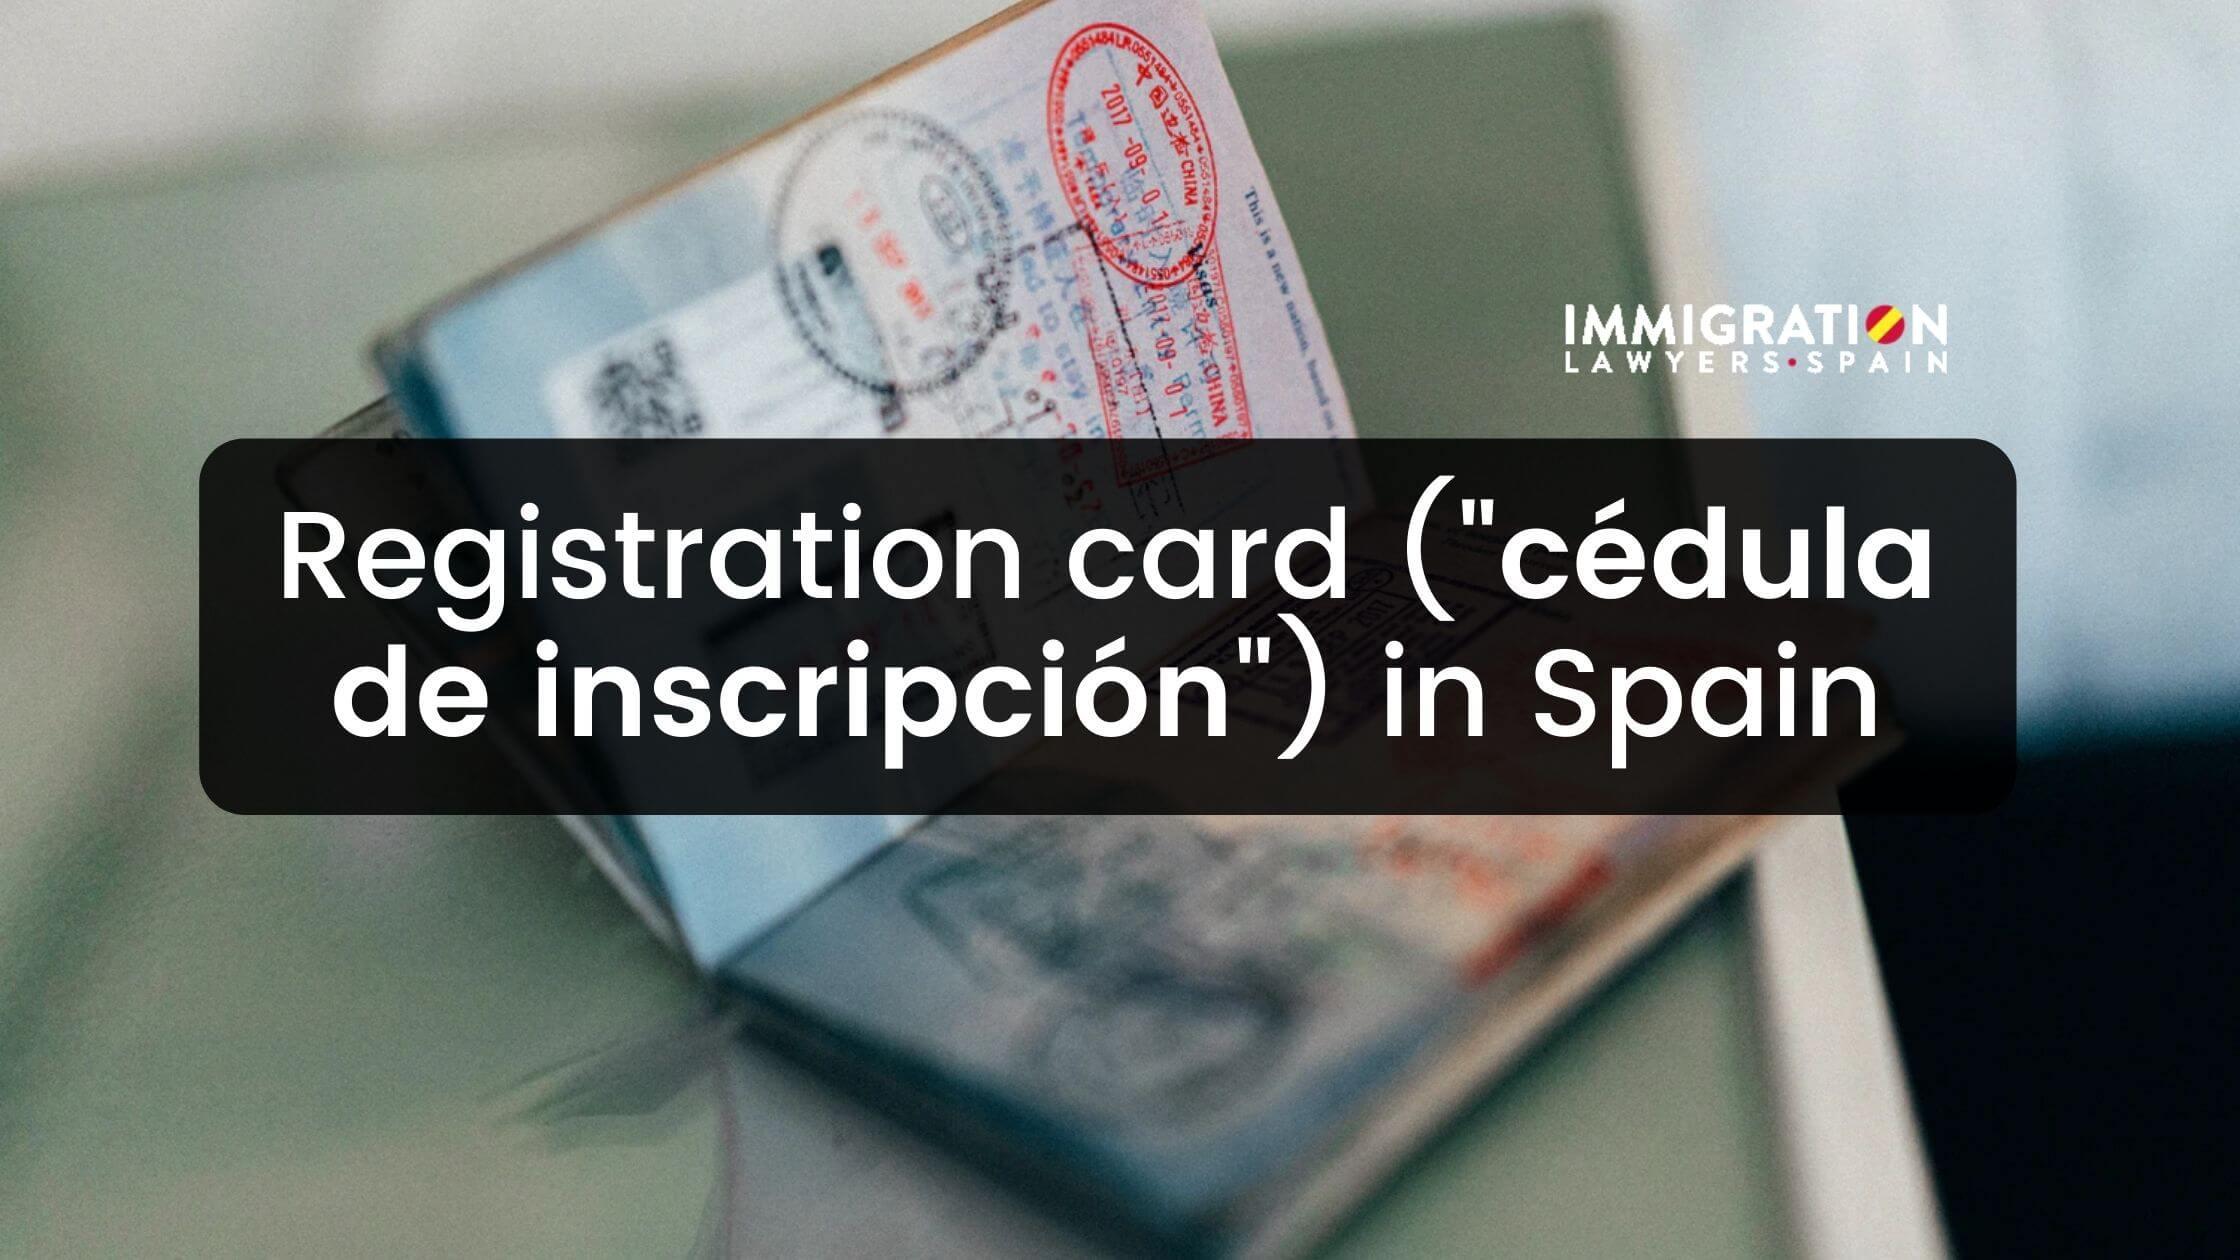 cédula inscripción for undocumented immigrants